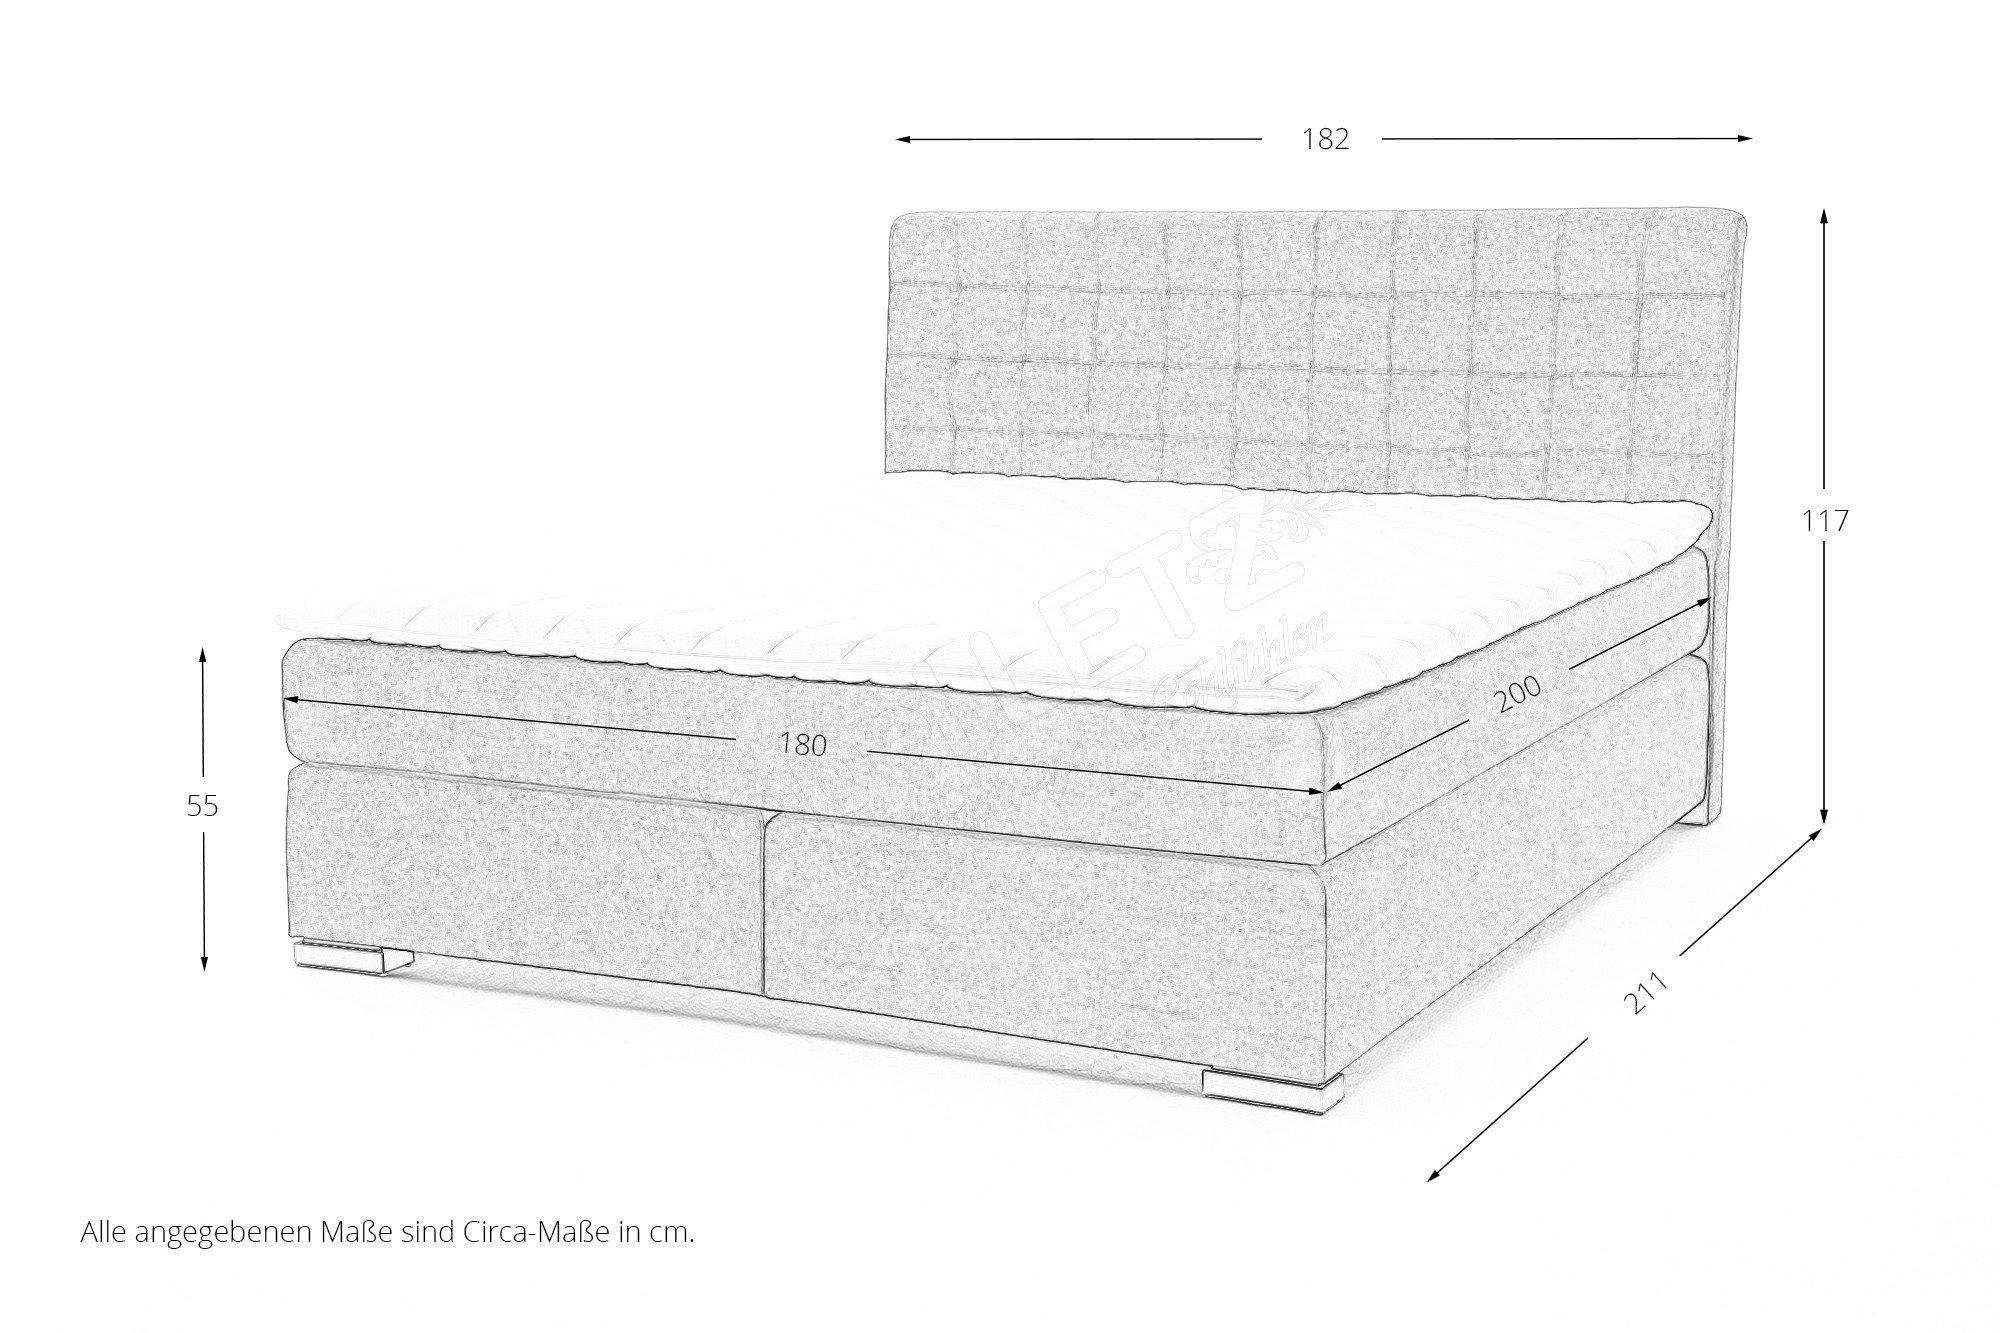 meise boxspringbett lenno in grau mit metallf en m bel letz ihr online shop. Black Bedroom Furniture Sets. Home Design Ideas